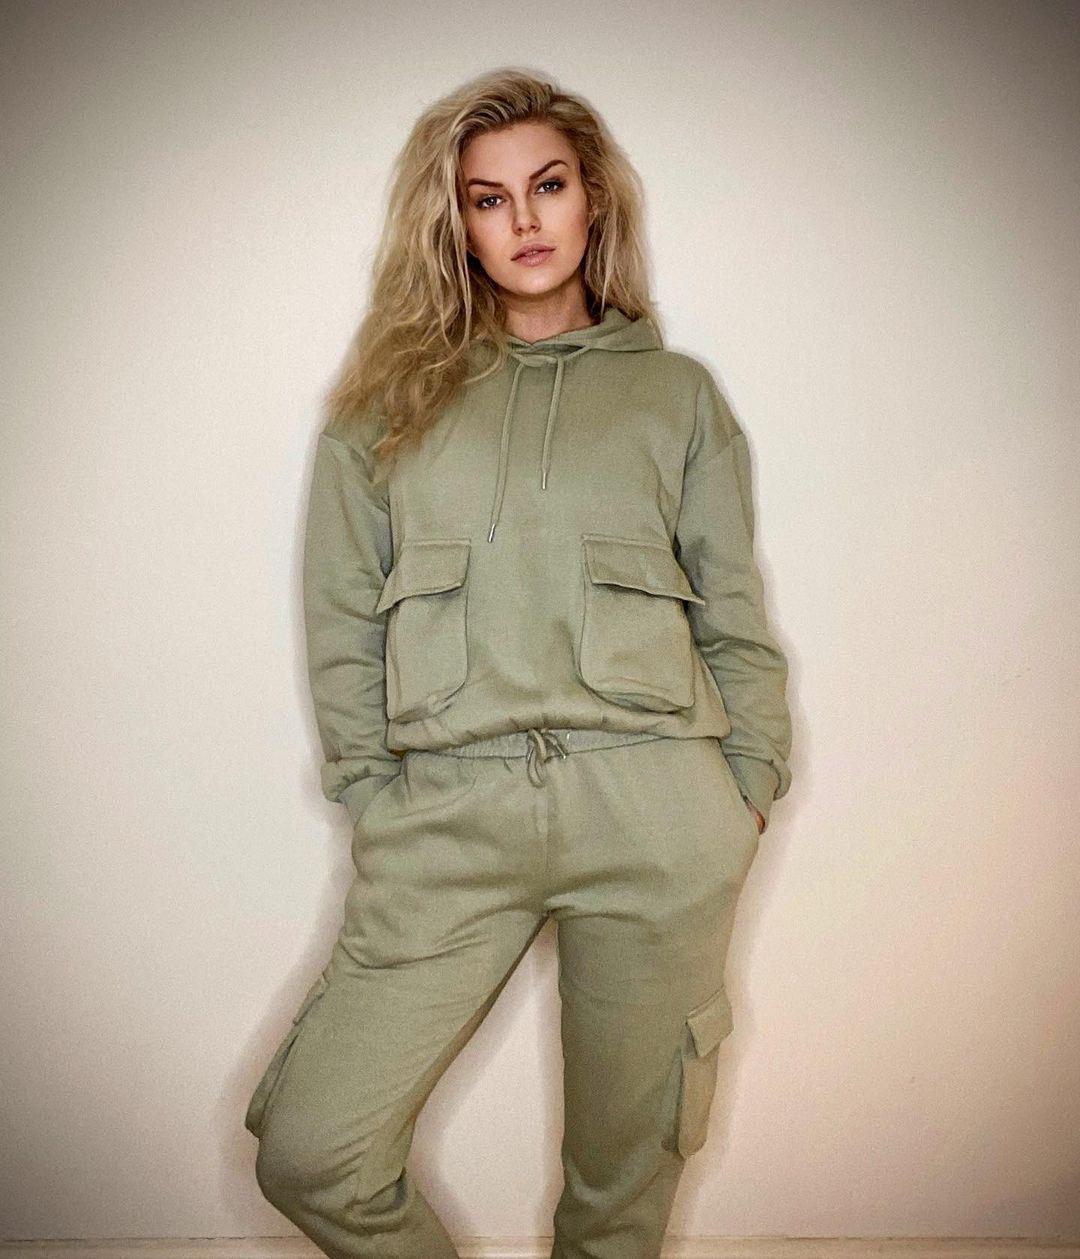 Giorgia-Walker-Wallpapers-Insta-Fit-Bio-4